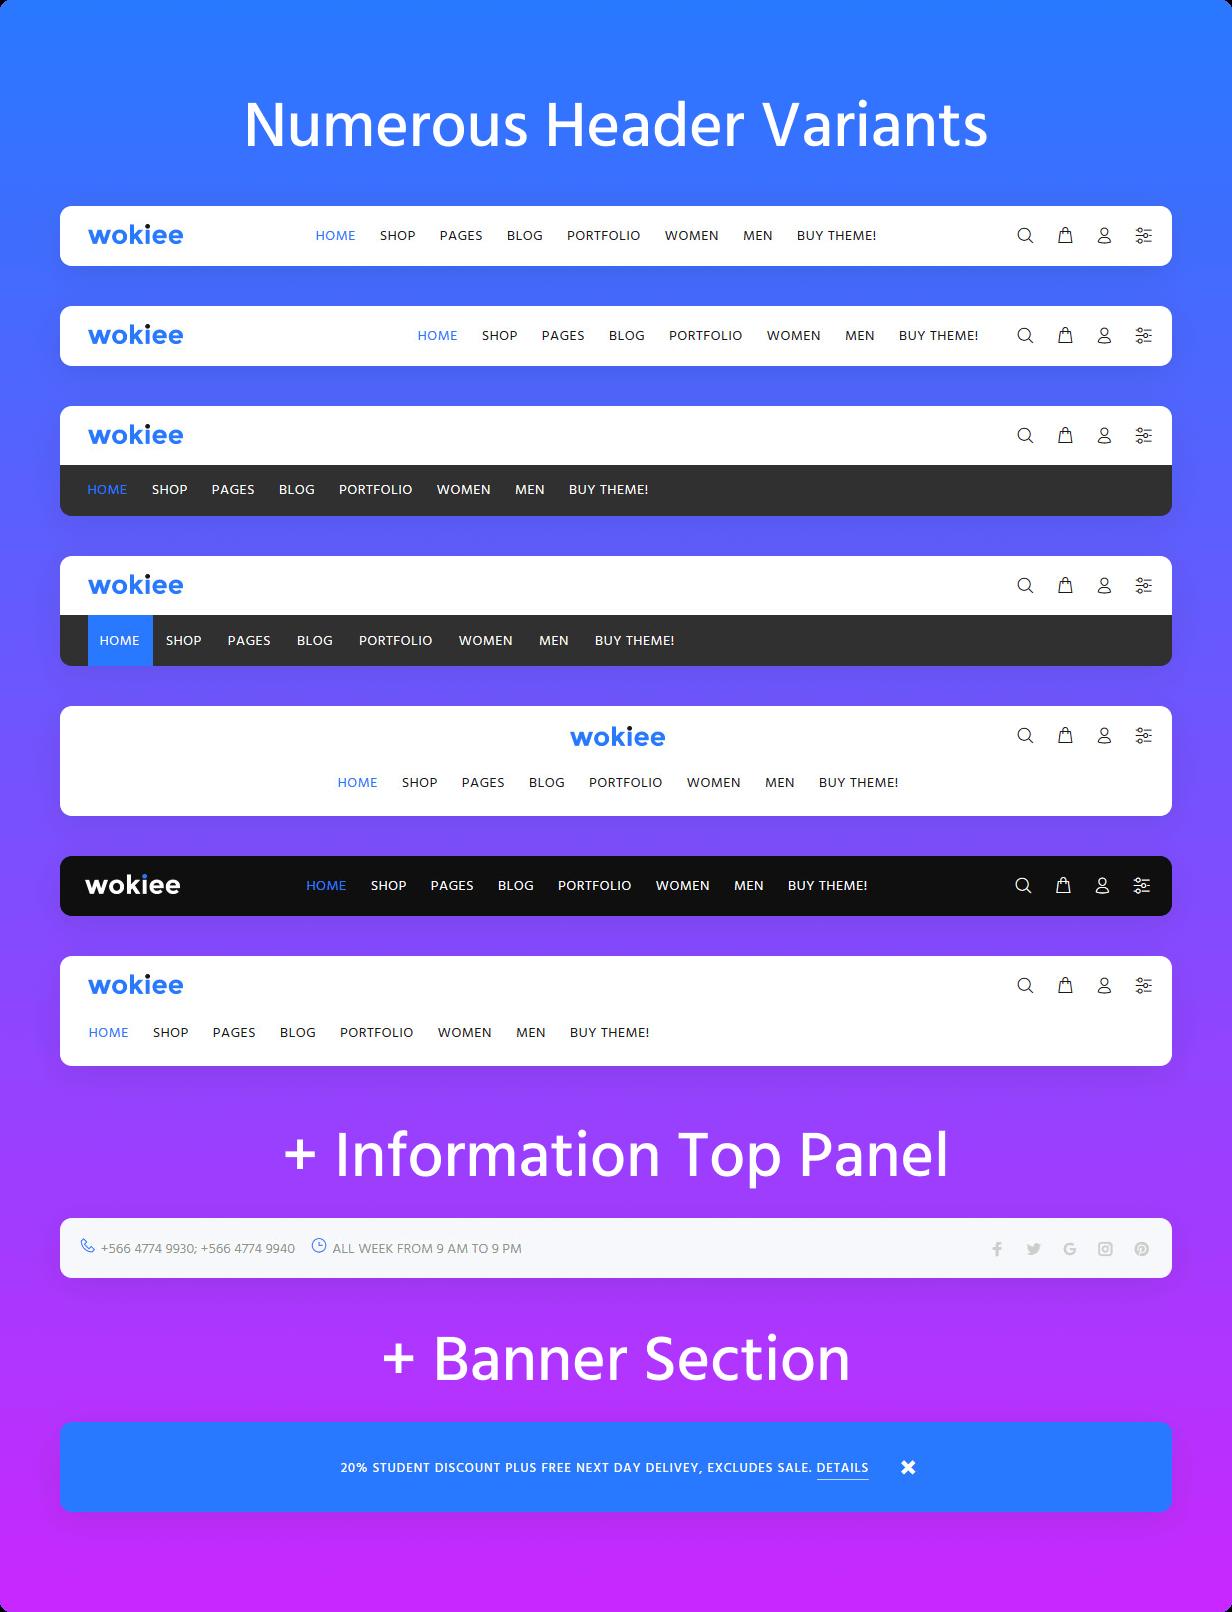 Wokiee - Ecommerce HTML Template - 10